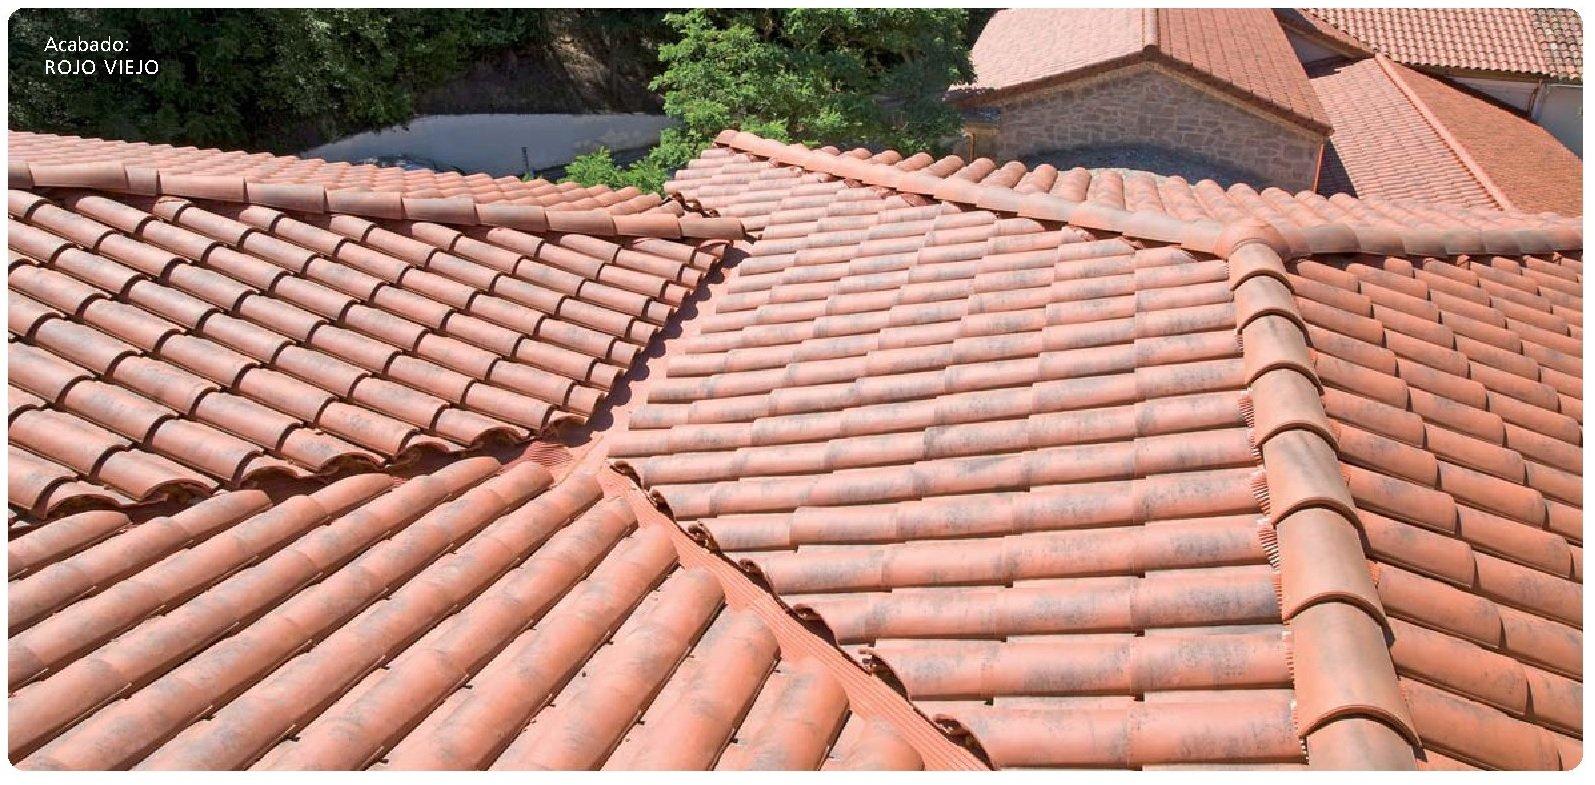 Teja cer mica klinker k2 cemat gijon asturias for Tejados de madera con teja